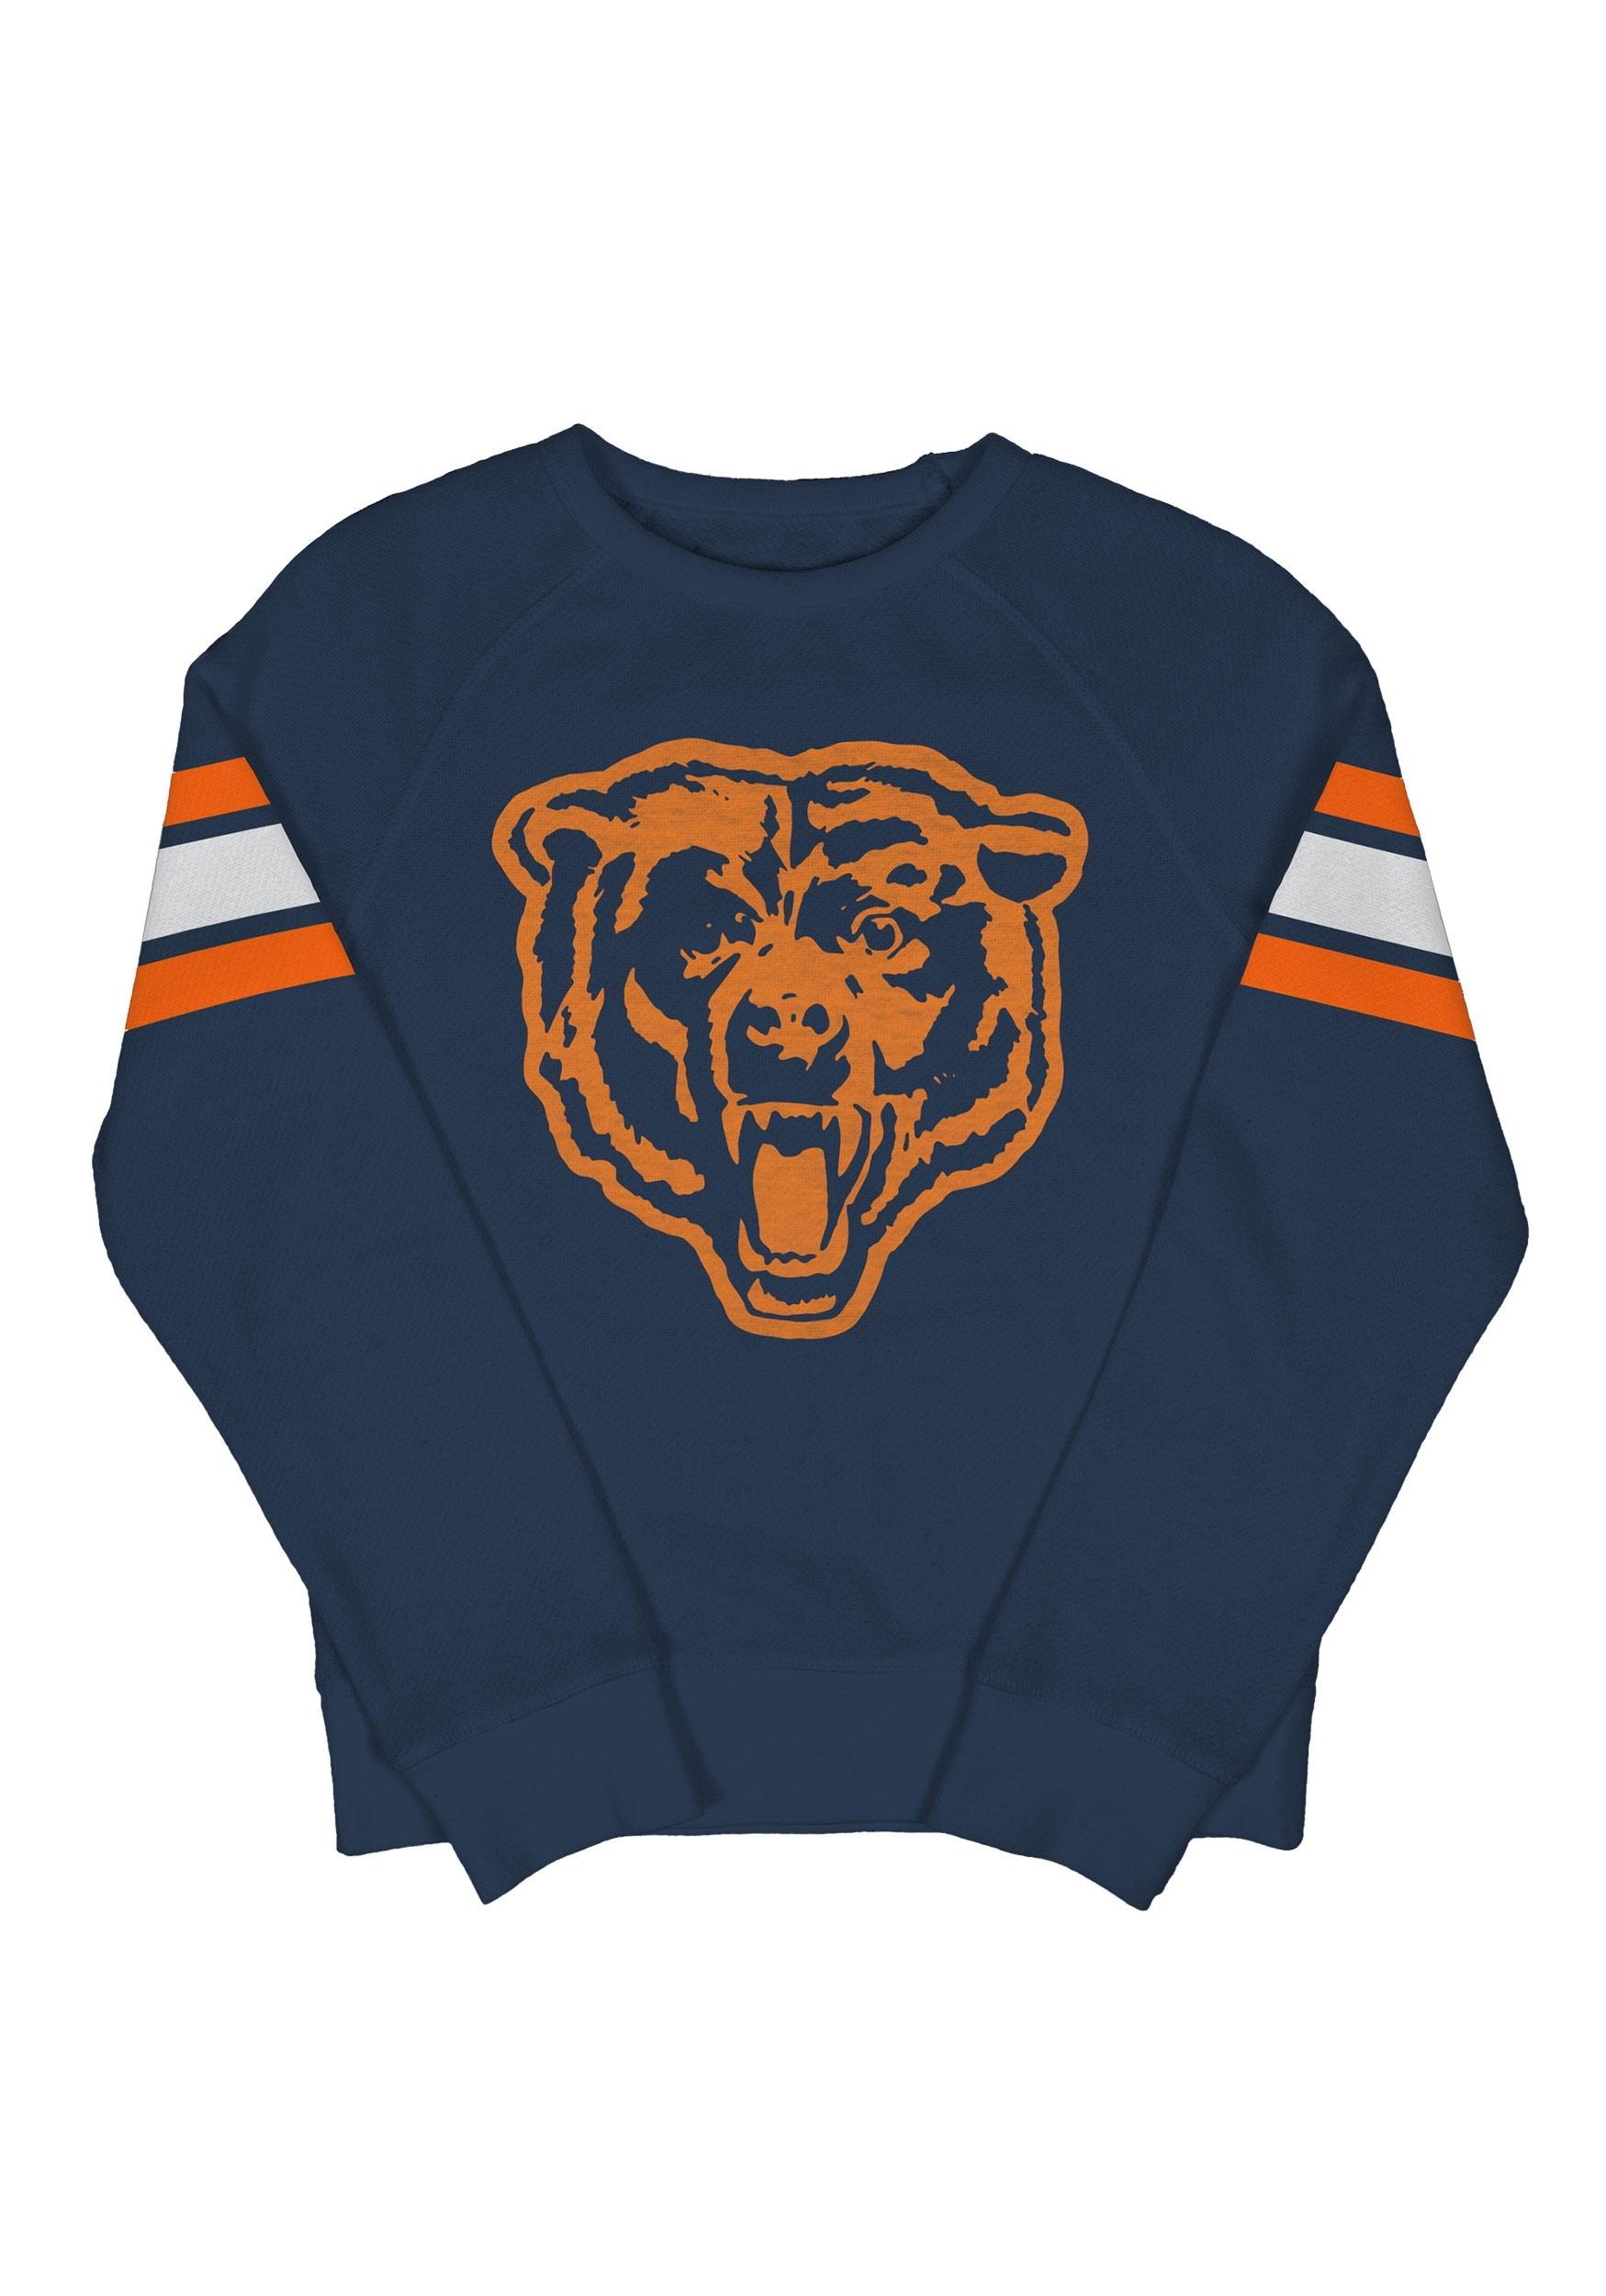 1dd159f4 Chicago Bears Kids Fleece Navy Crewneck